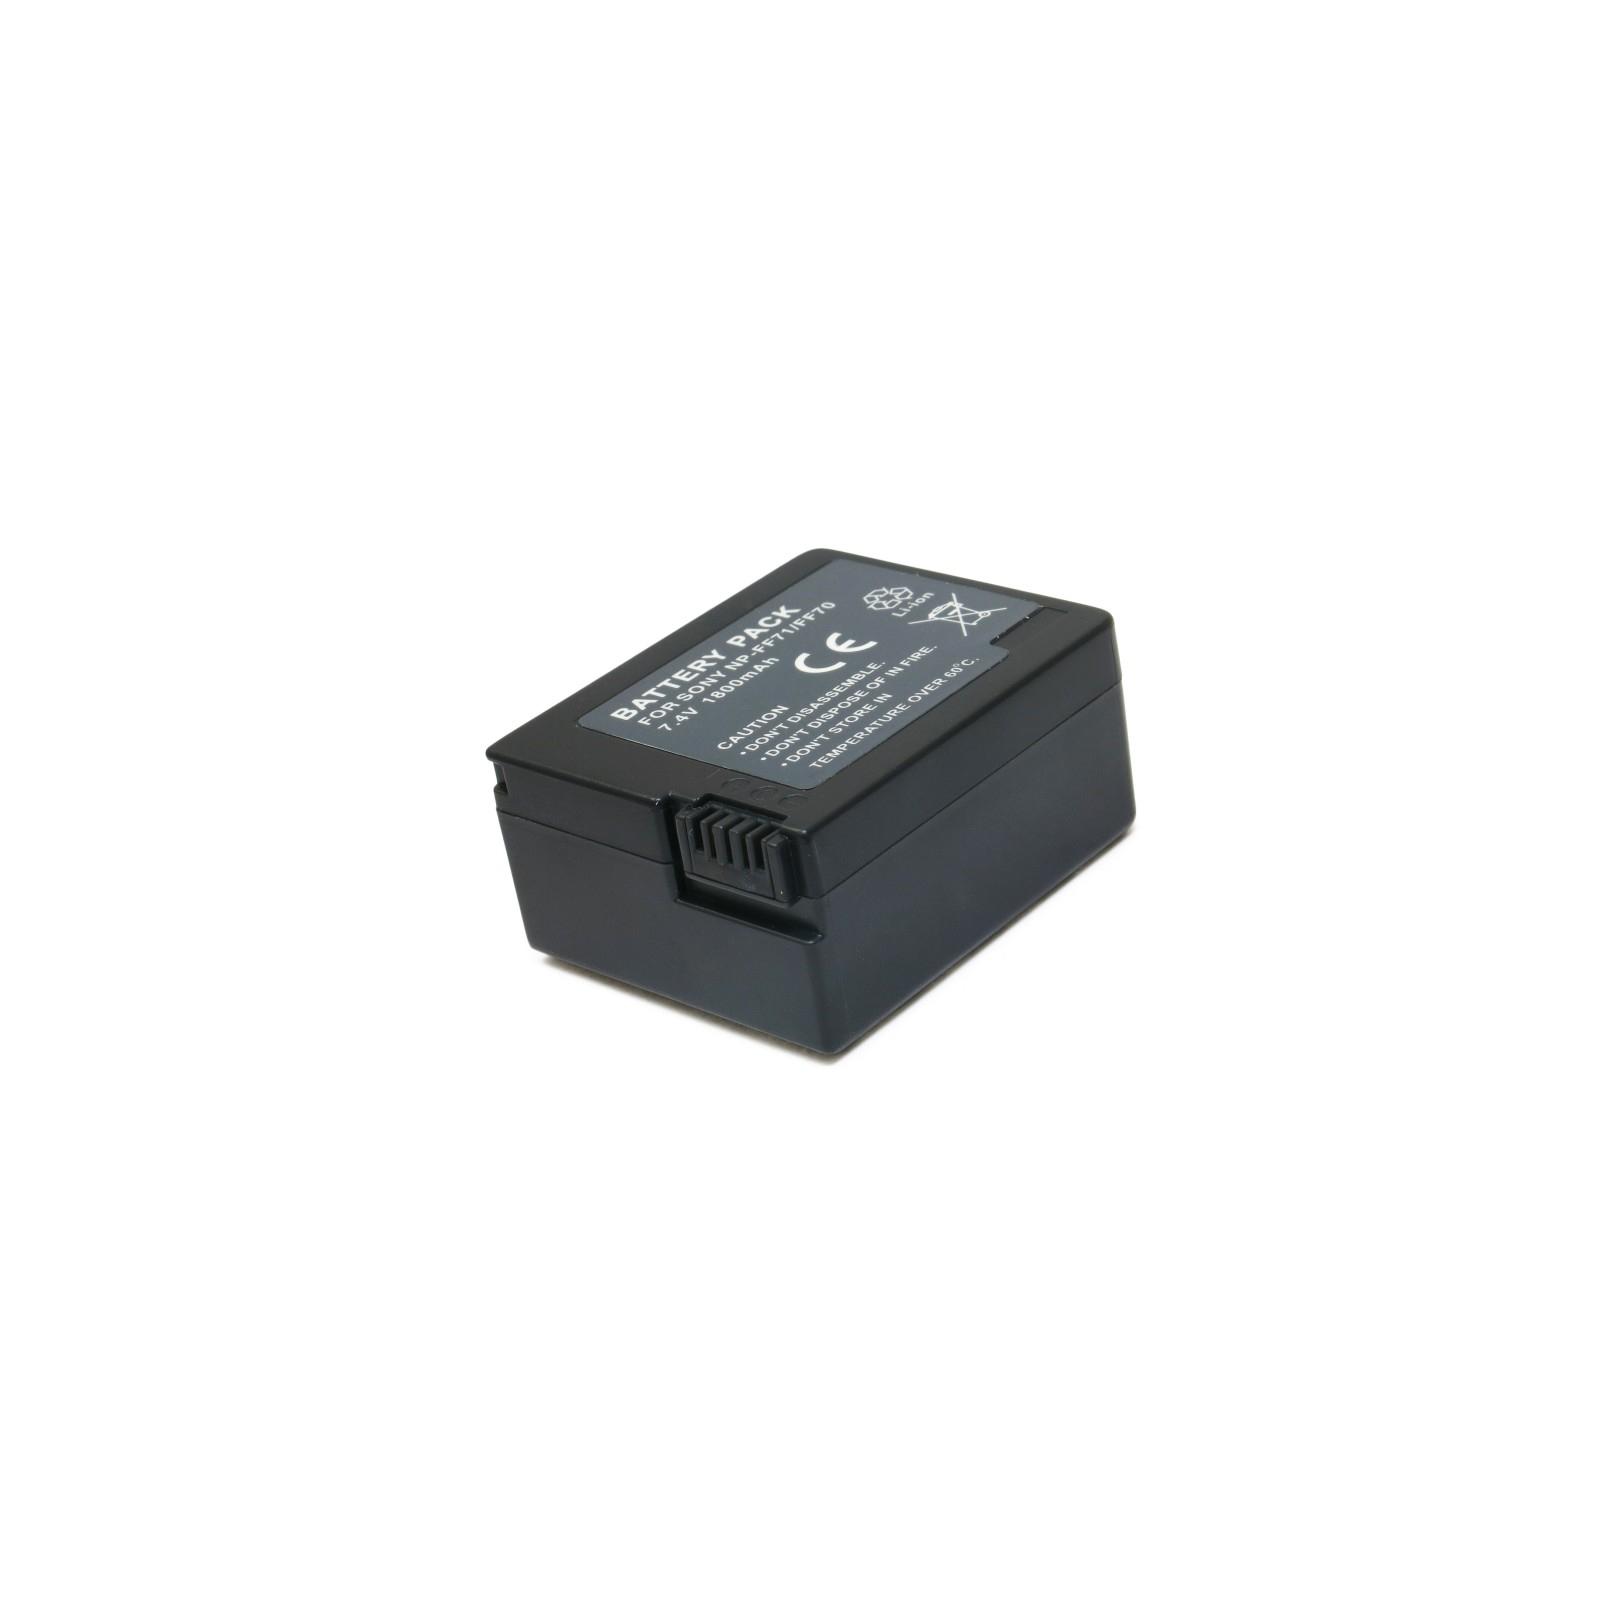 Аккумулятор к фото/видео EXTRADIGITAL Sony NP-FF70 (DV00DV1035) изображение 4